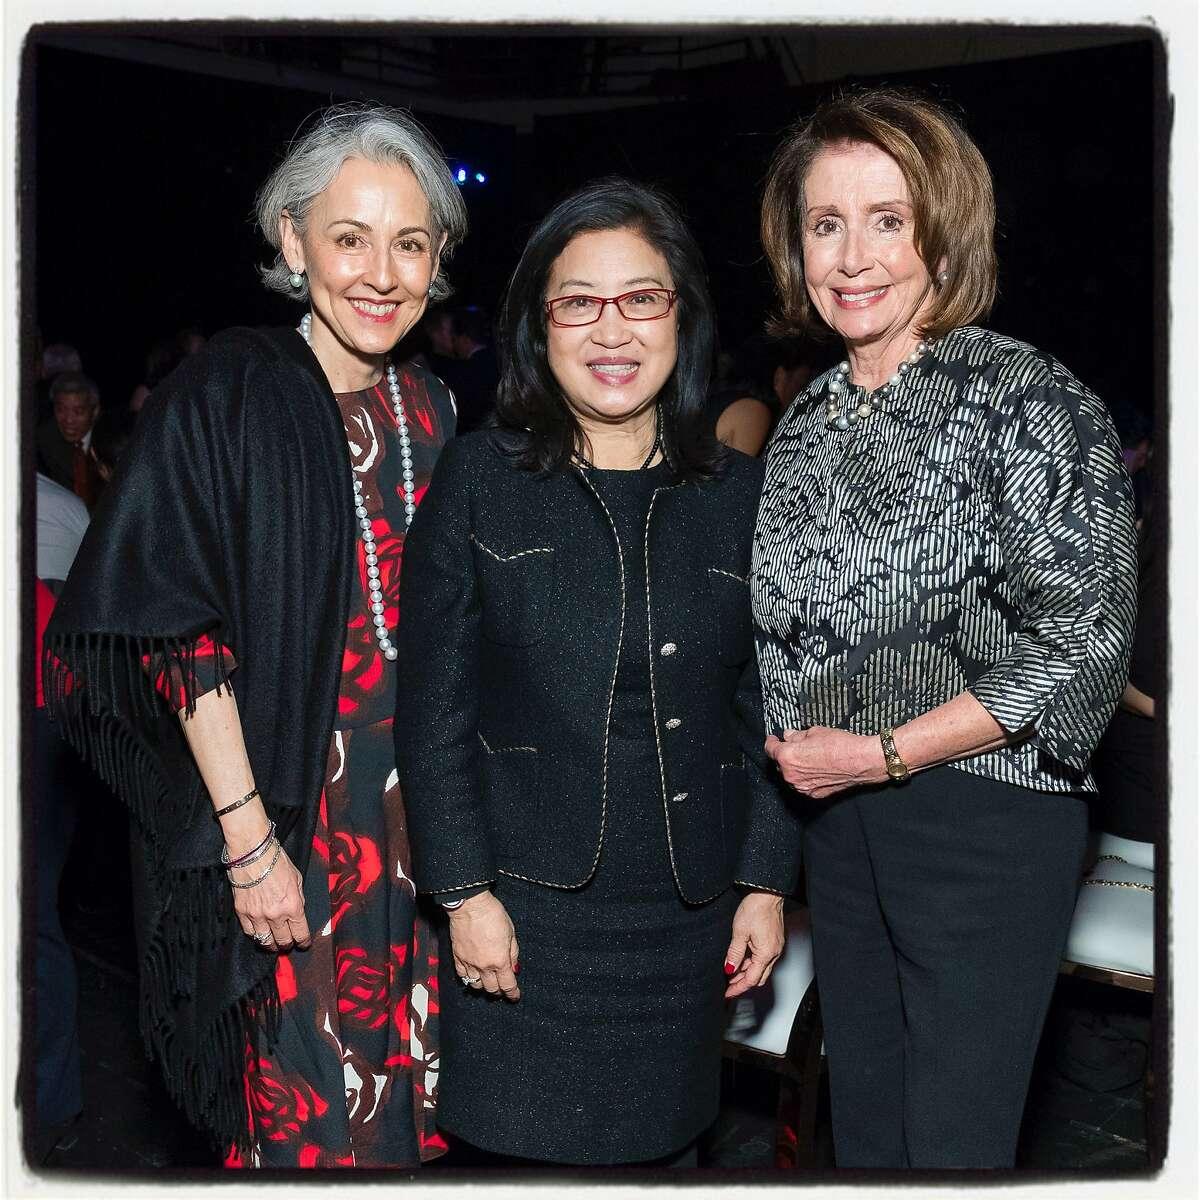 SFS President Sako Fisher (left) with Anita Lee and Rep. Nancy Pelosi at Sound Box. Feb. 24, 2018.